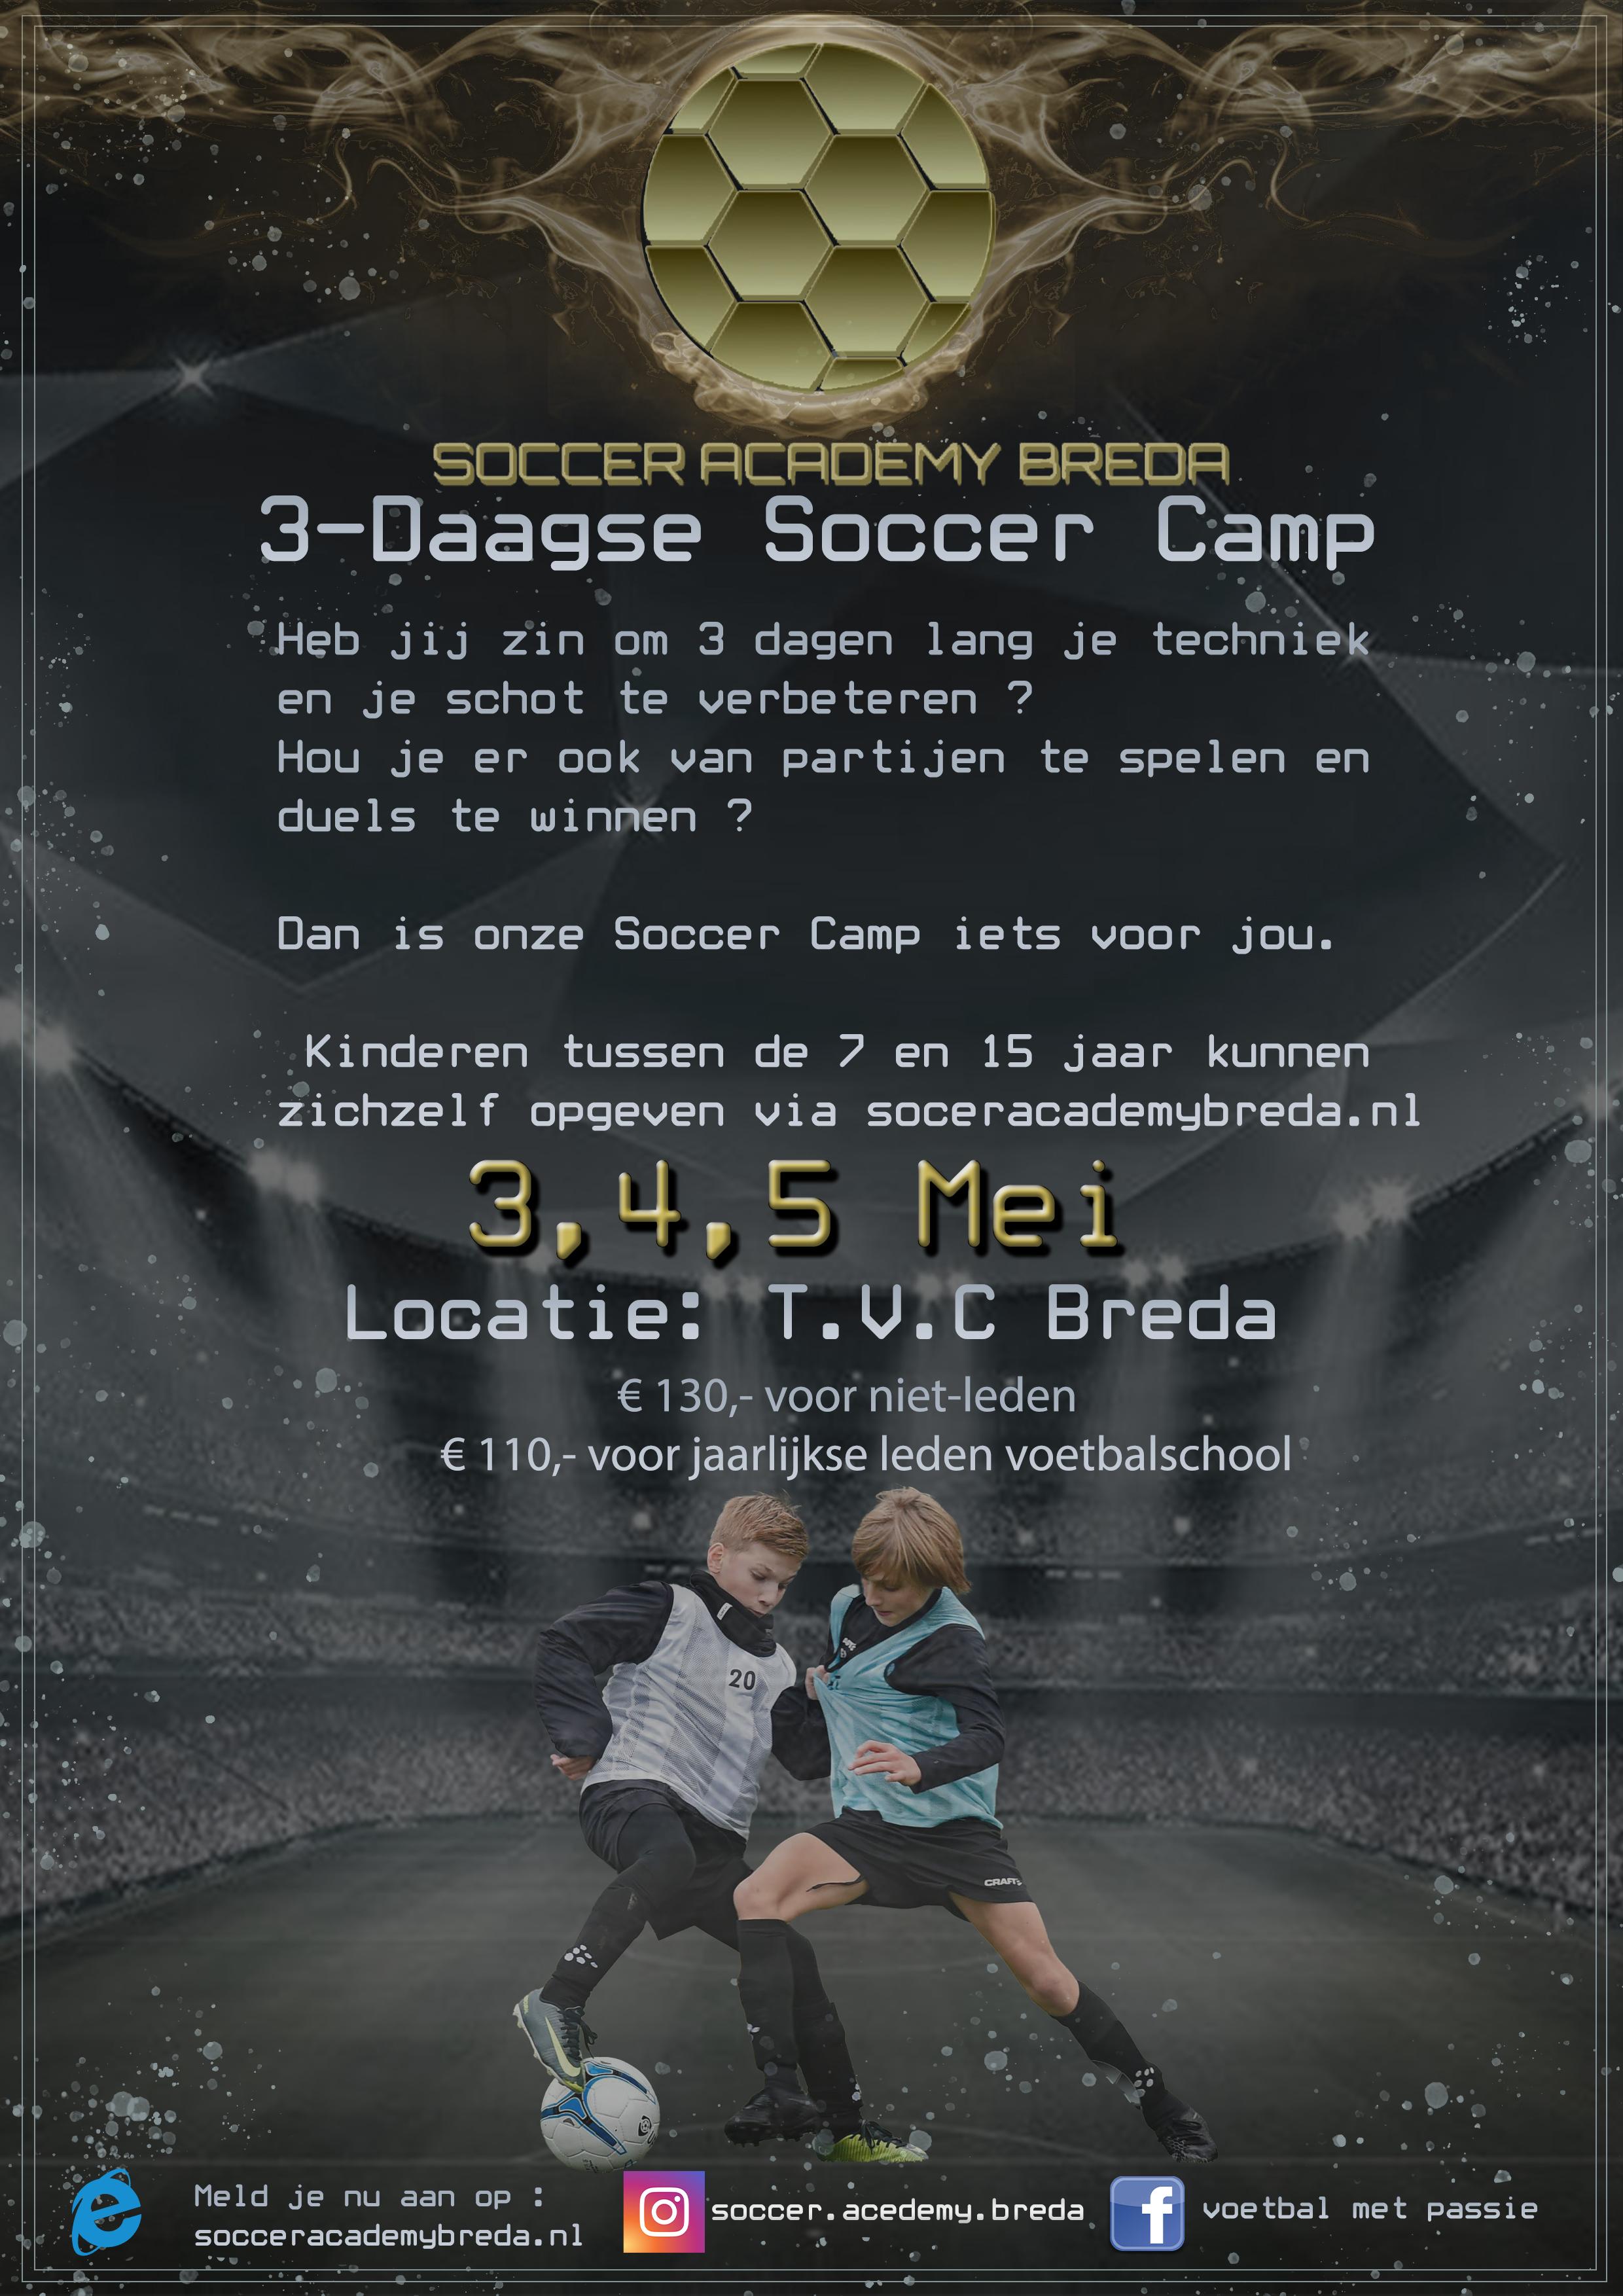 https://socceracademybreda.nl/wp-content/uploads/2021/04/Flyer-SAB-Soccer-Camp345mei8790.jpg